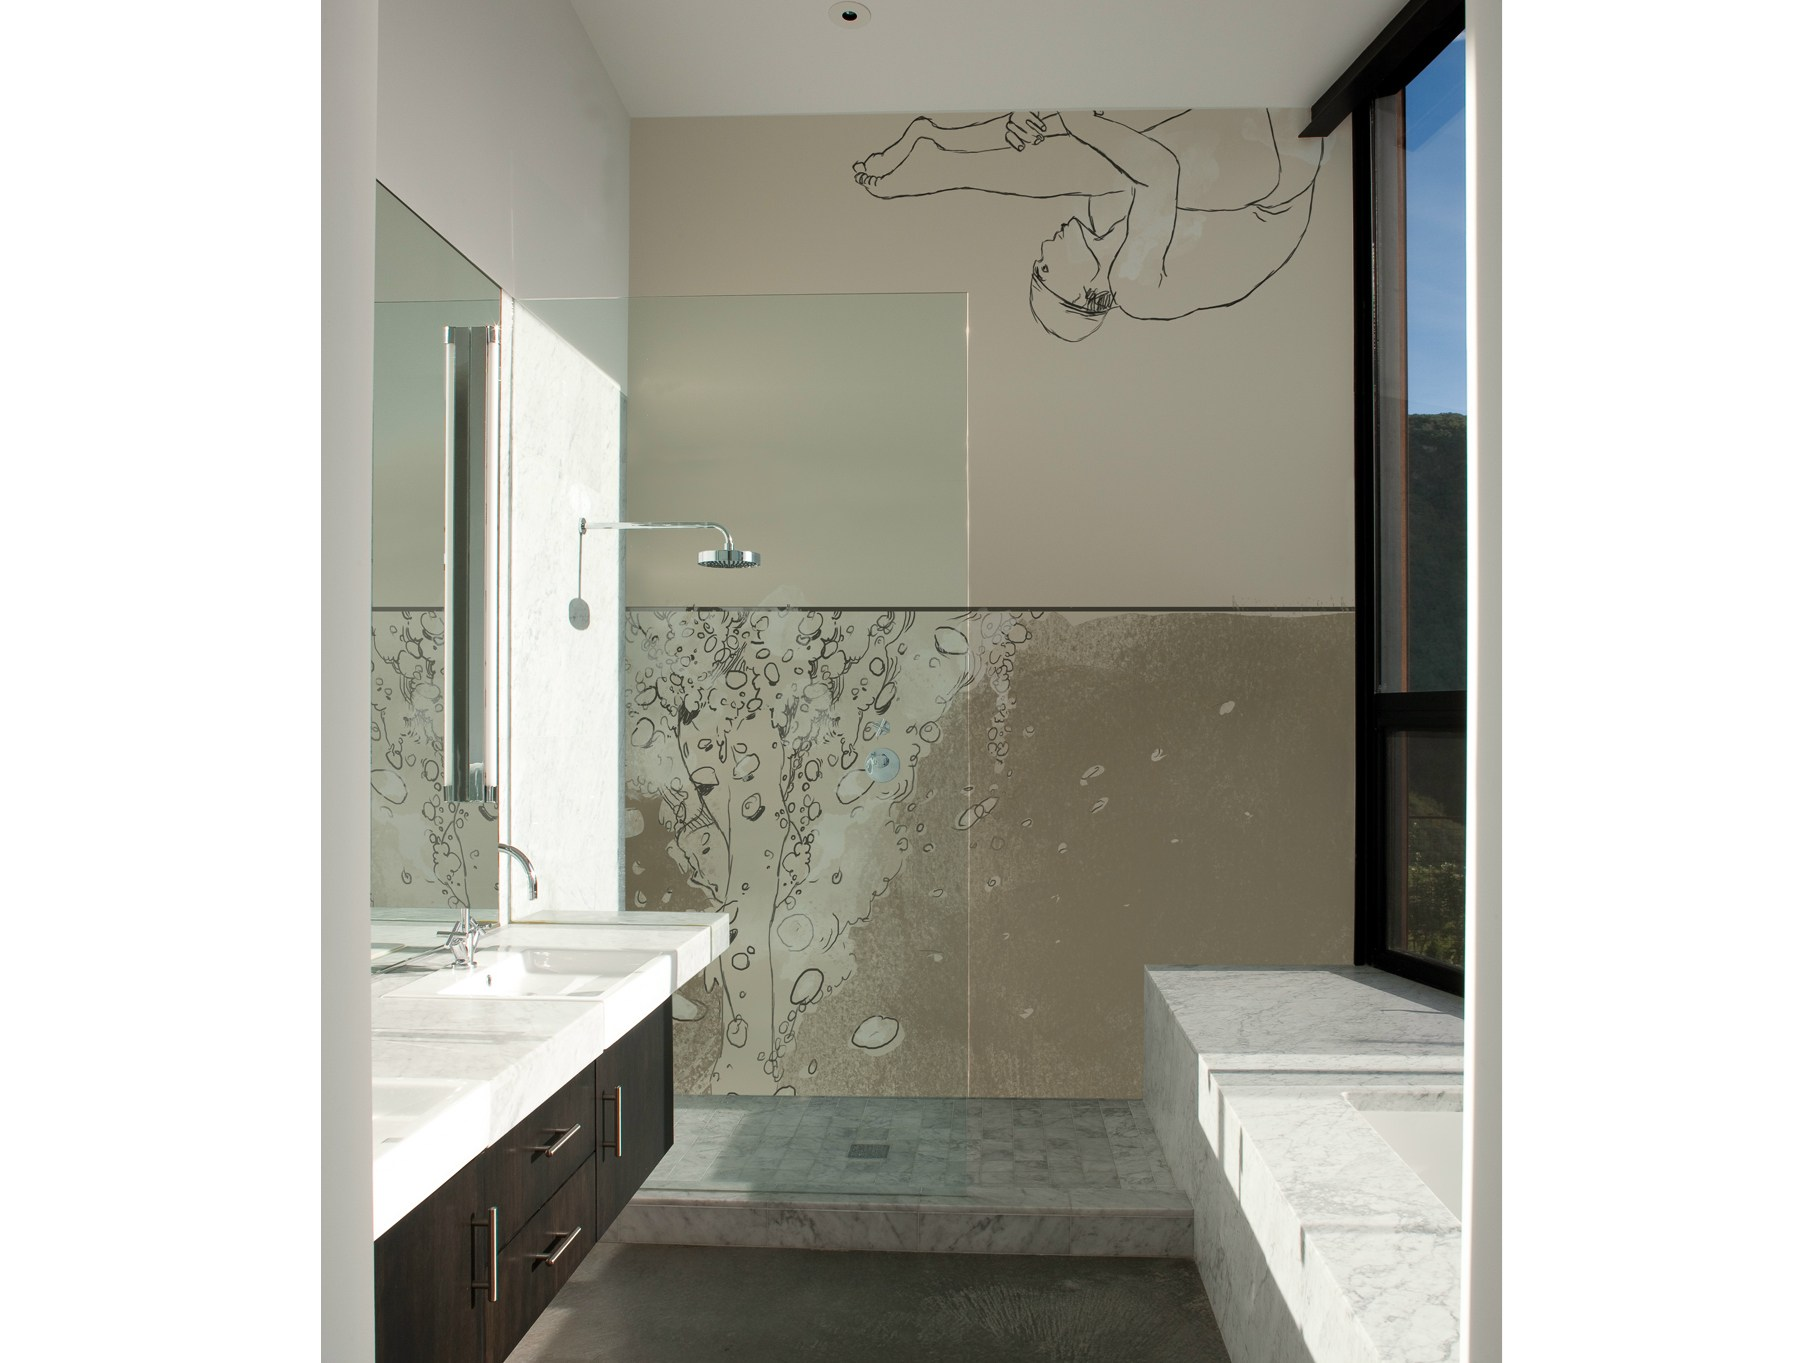 Papel pintado para ba os splash by wall dec dise o - Papeles pintados lavables ...